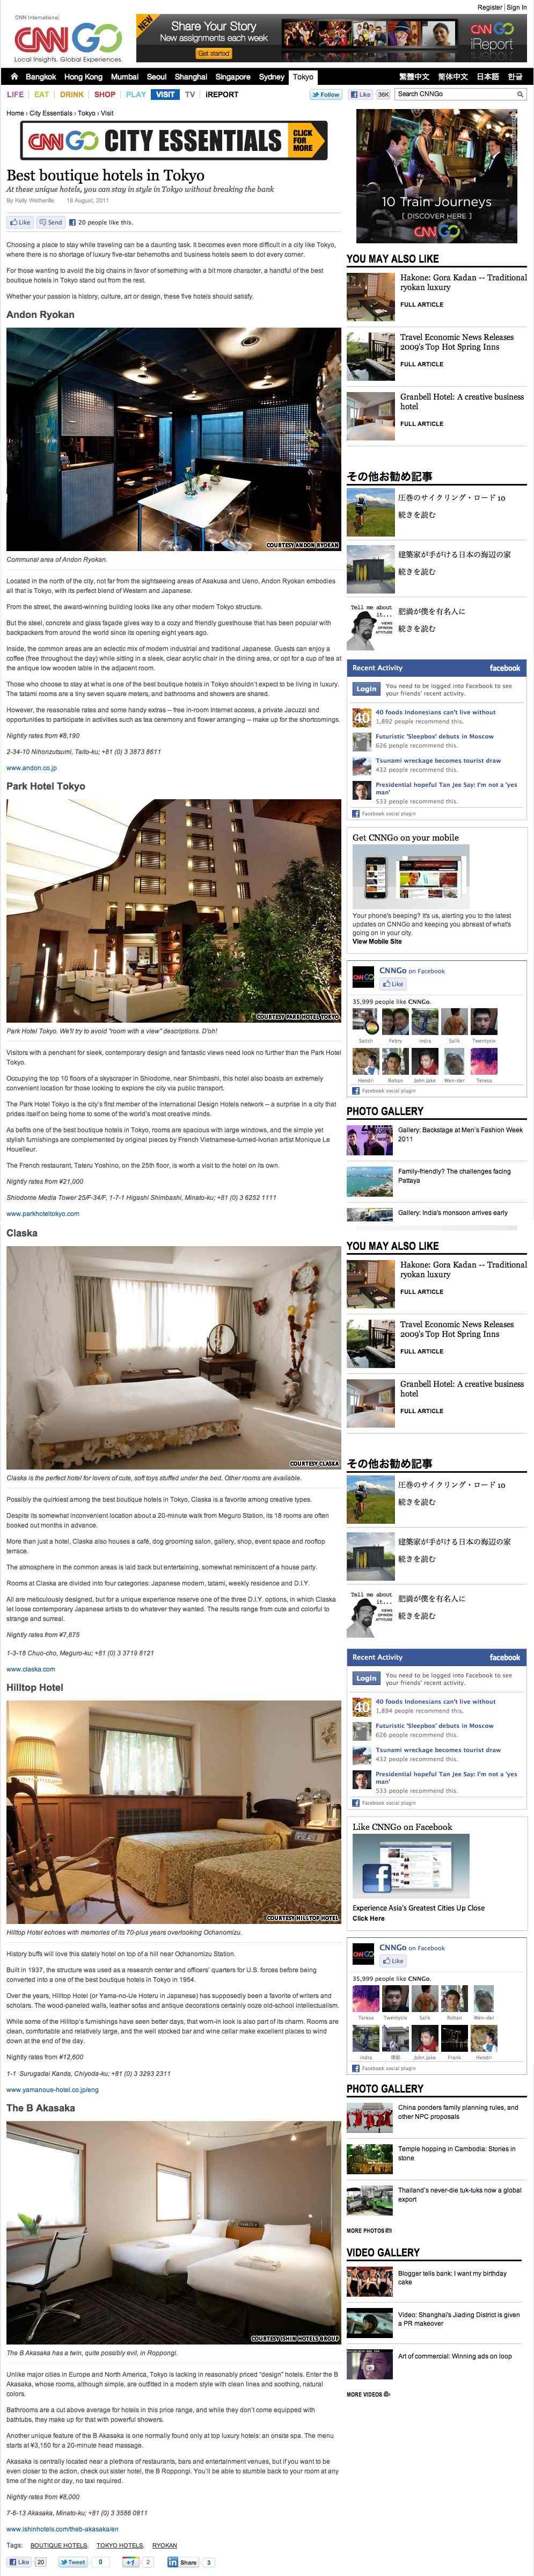 Tokyo s best boutique hotels kelly wetherille for Best boutique hotels japan